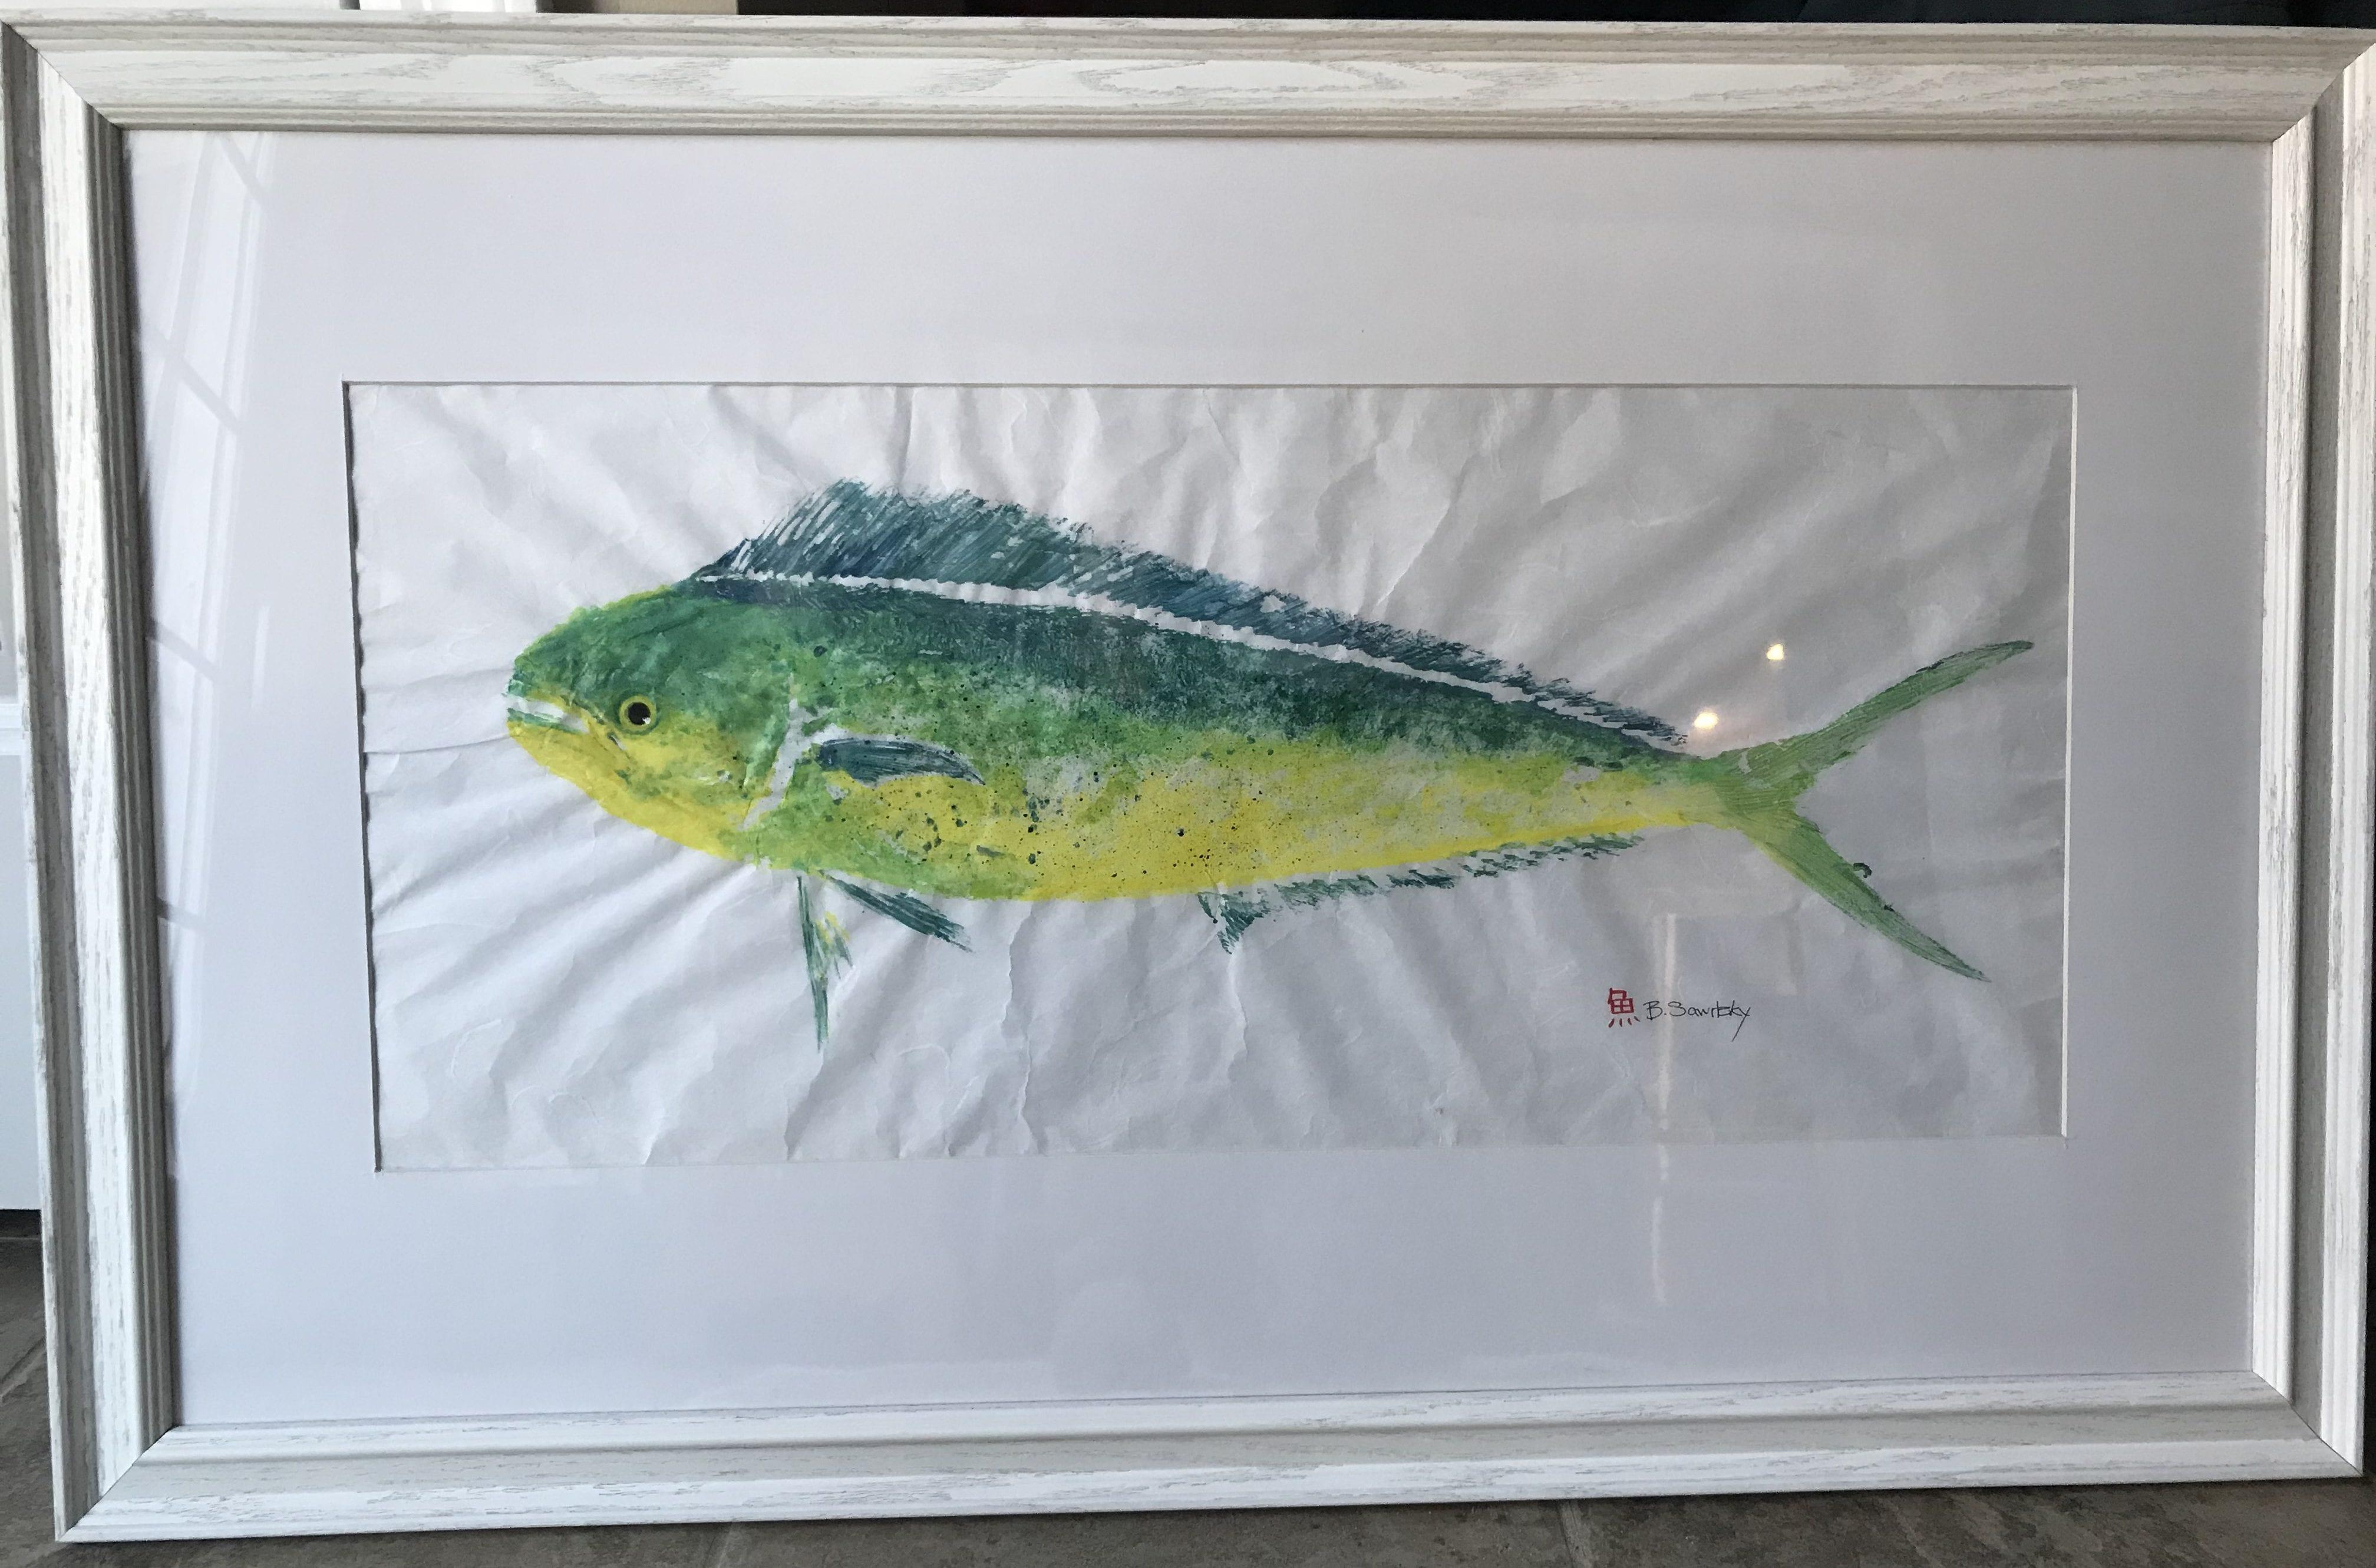 Gyotaku Painting by Bridget Sawitsky